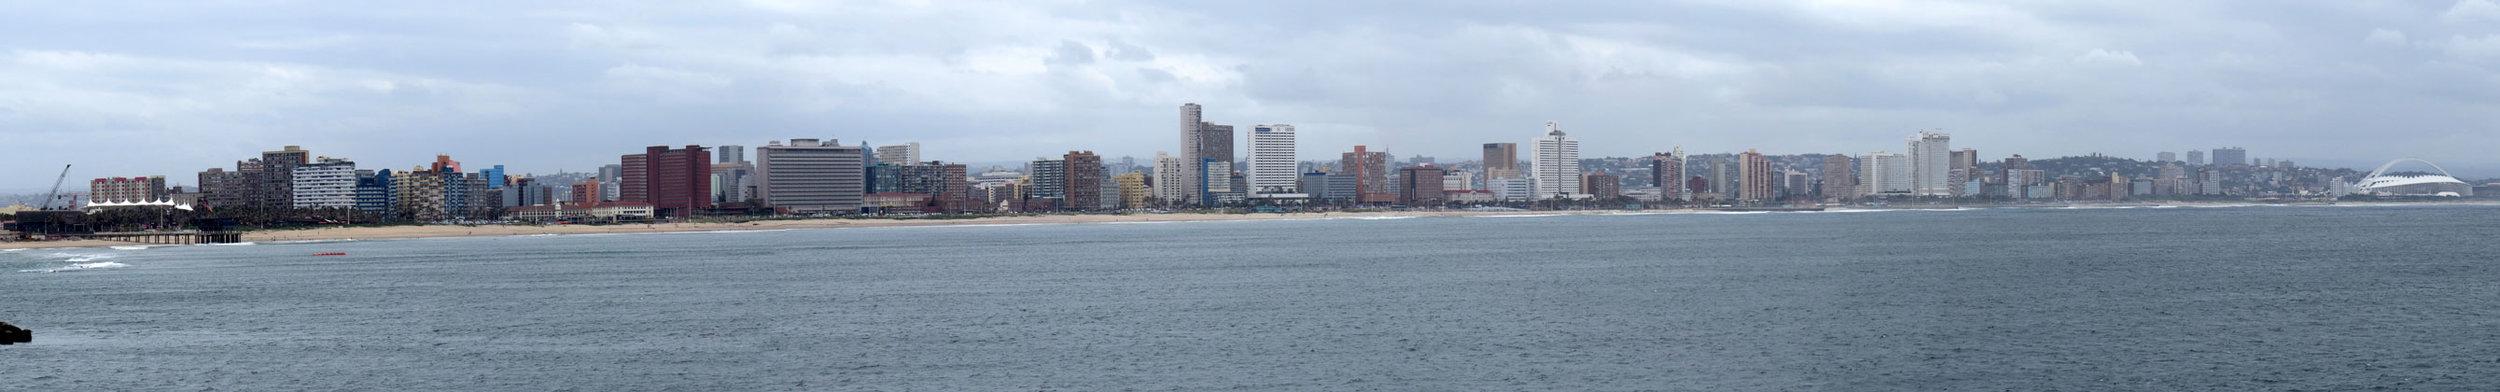 Durban-Panorama1.jpg